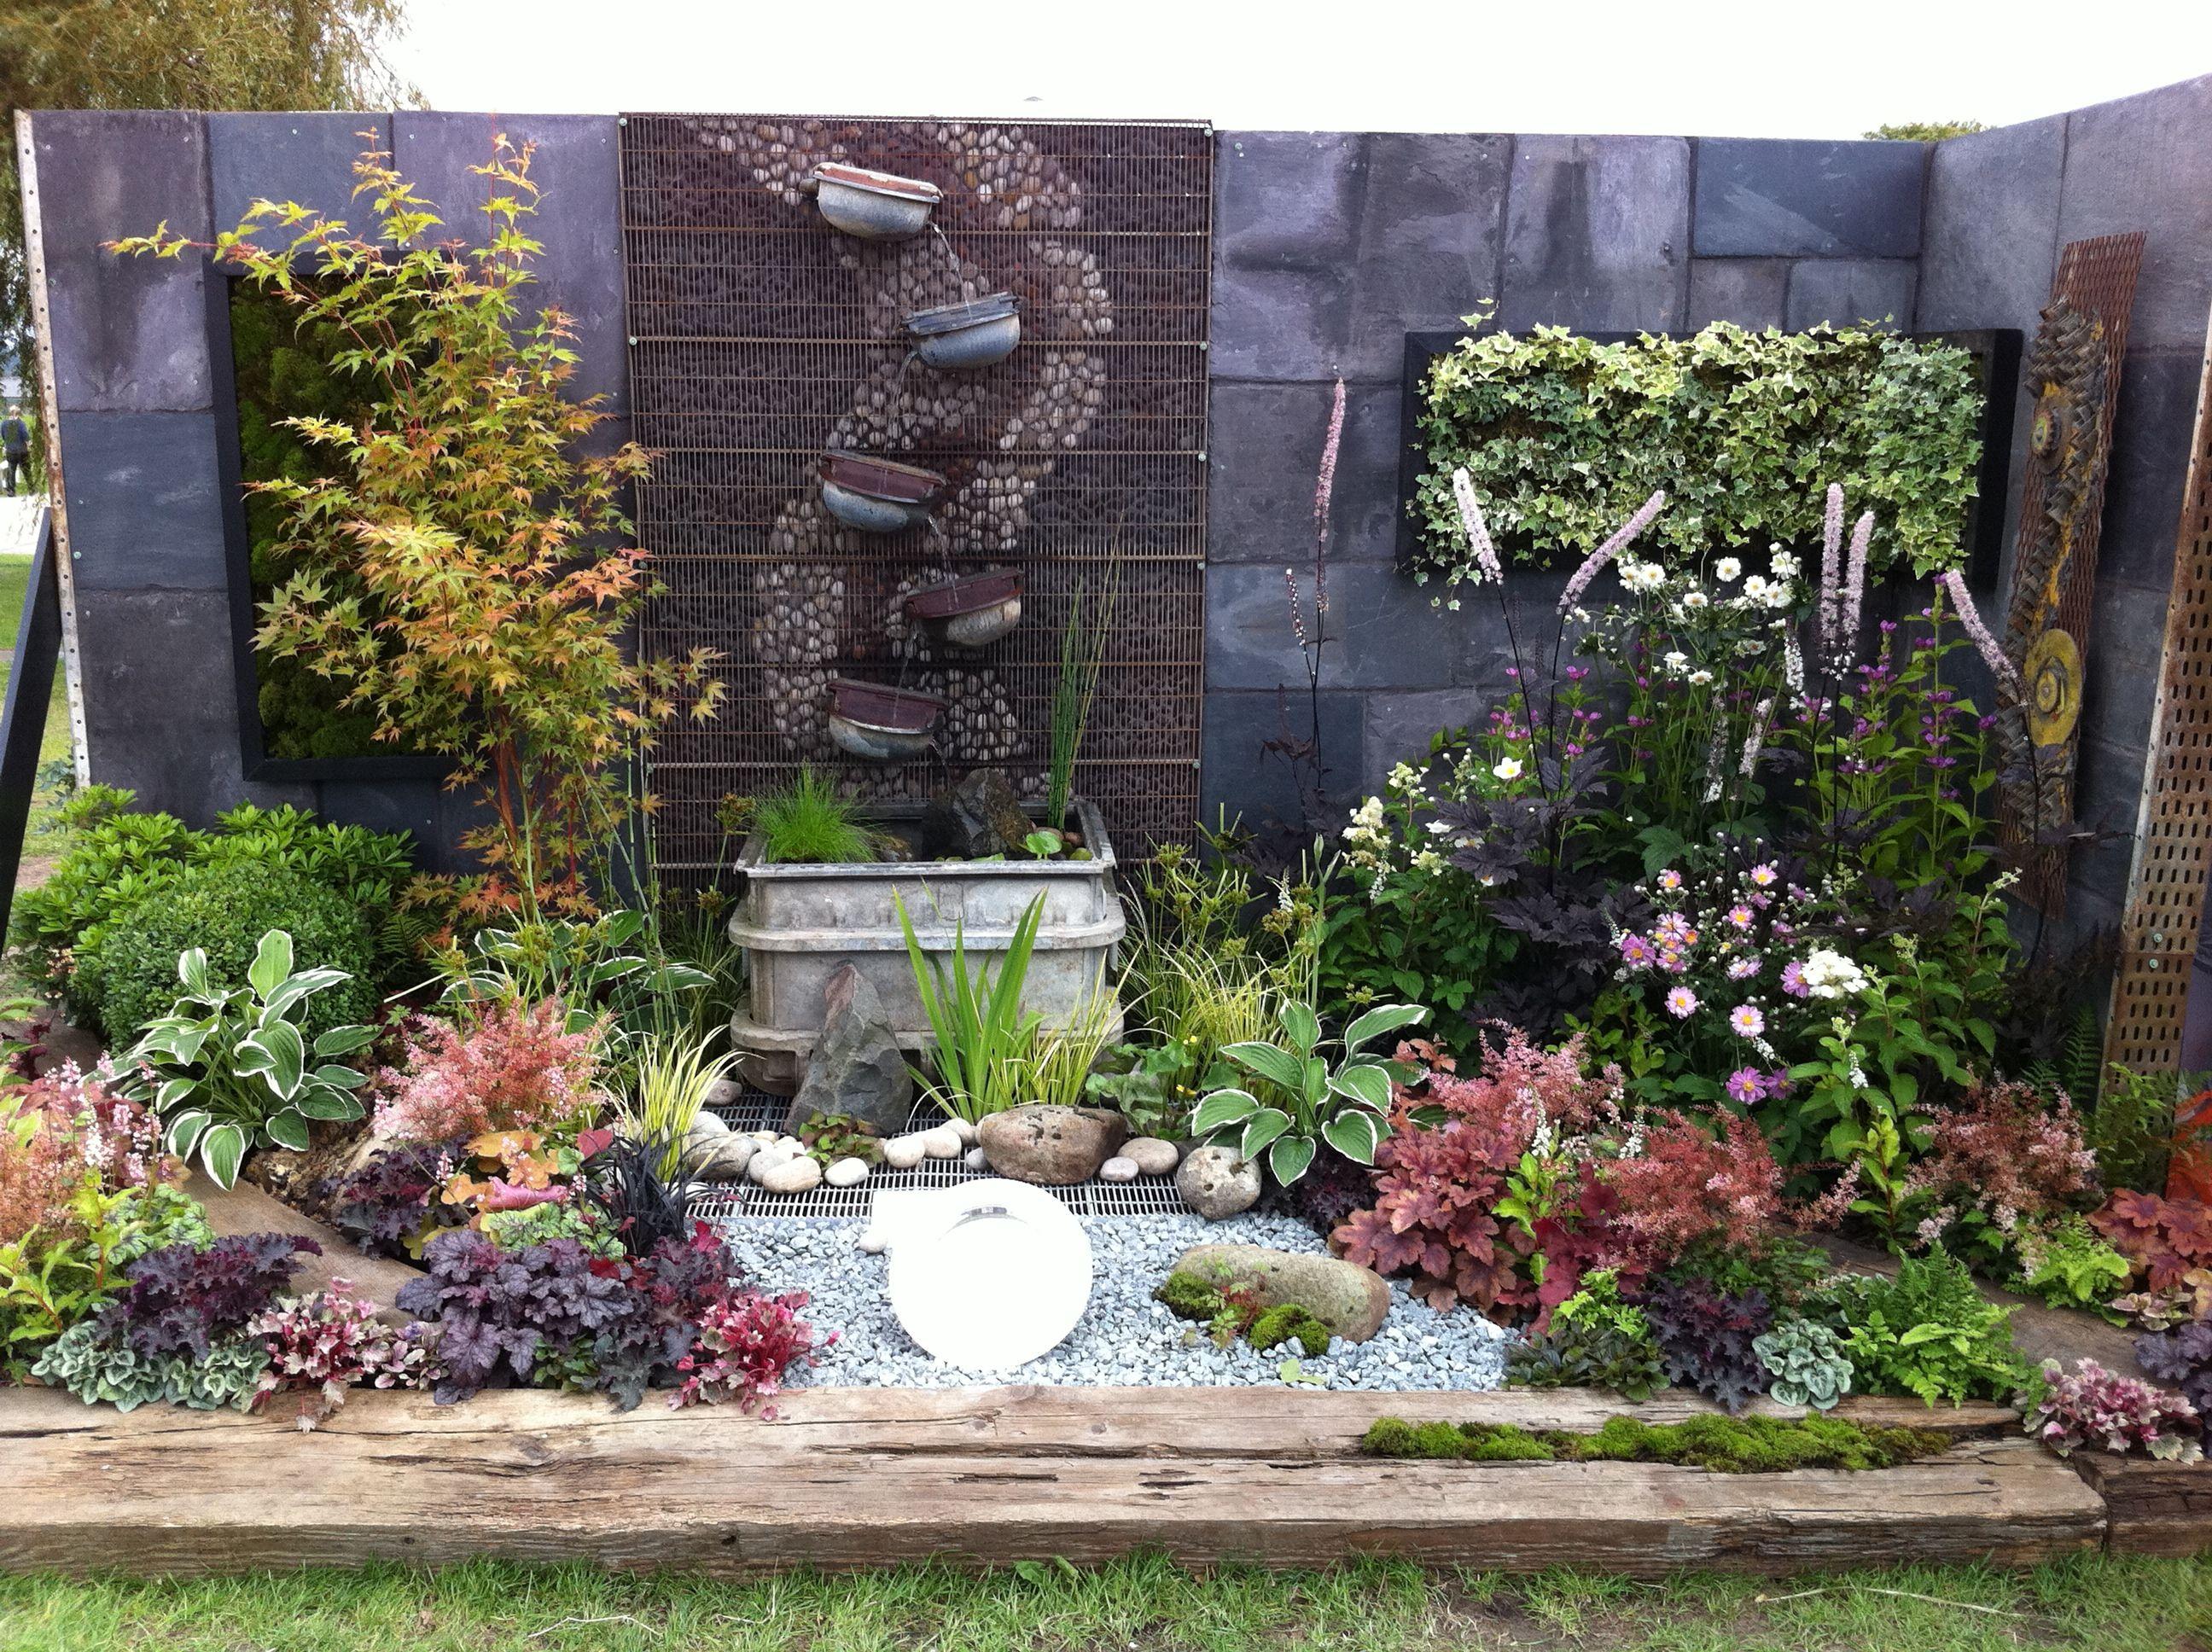 The Contemplation corner by garden designer Jeni Cairns Juniper